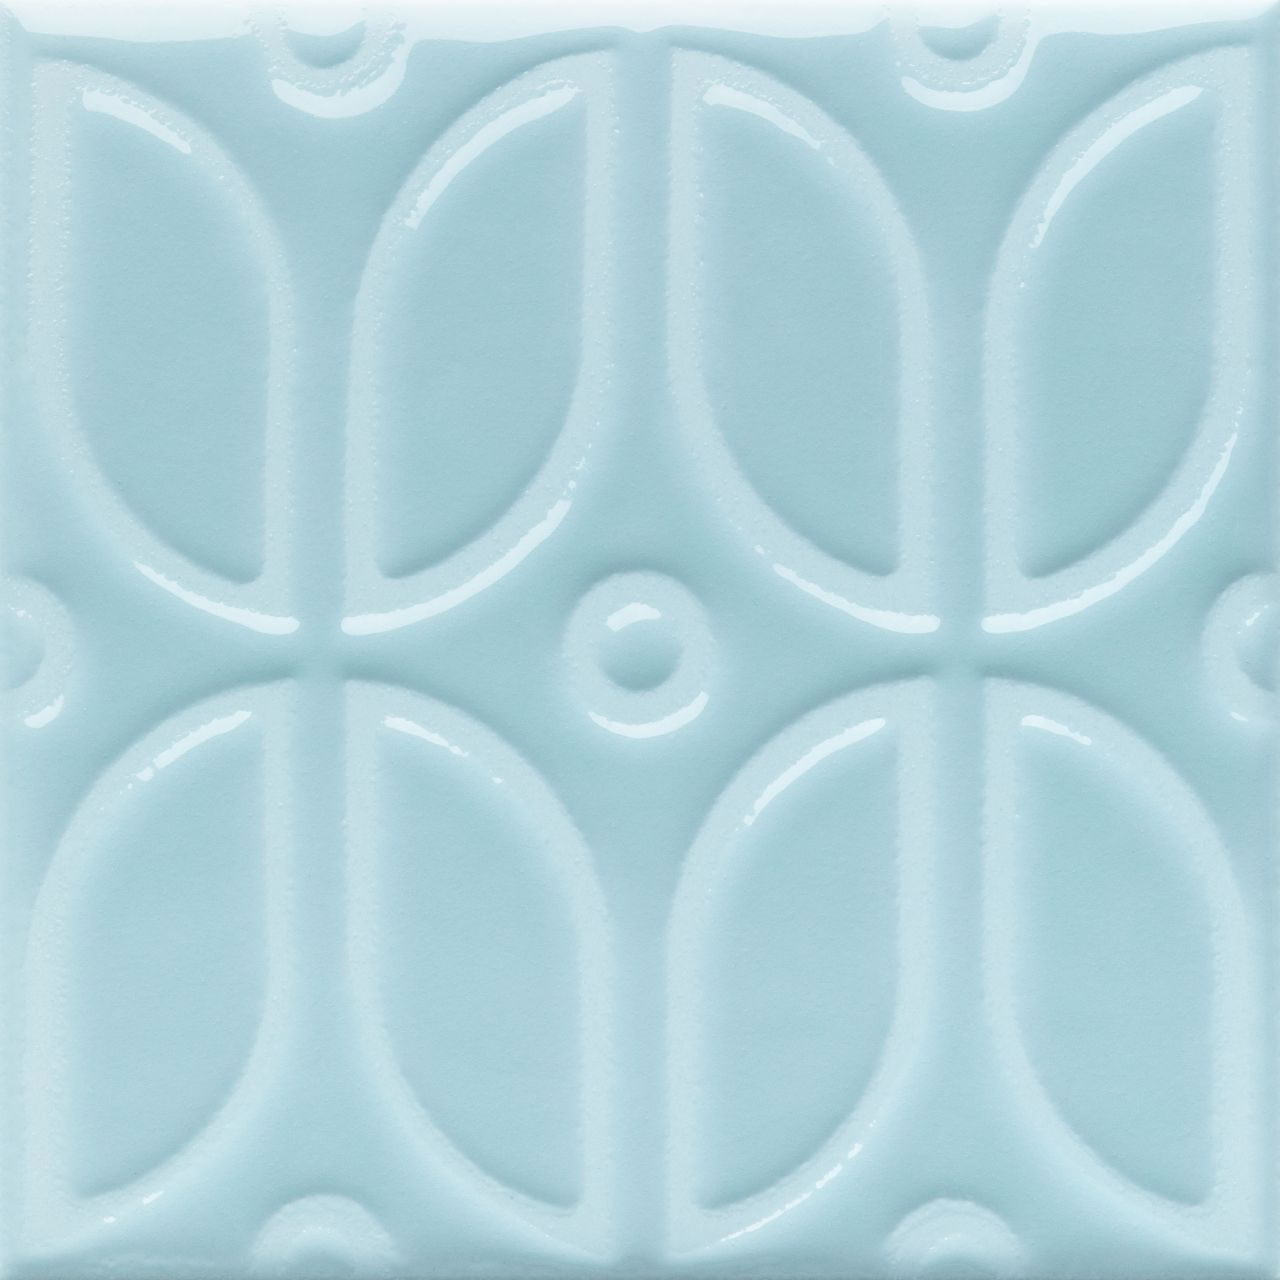 glacial azul ac 15×15